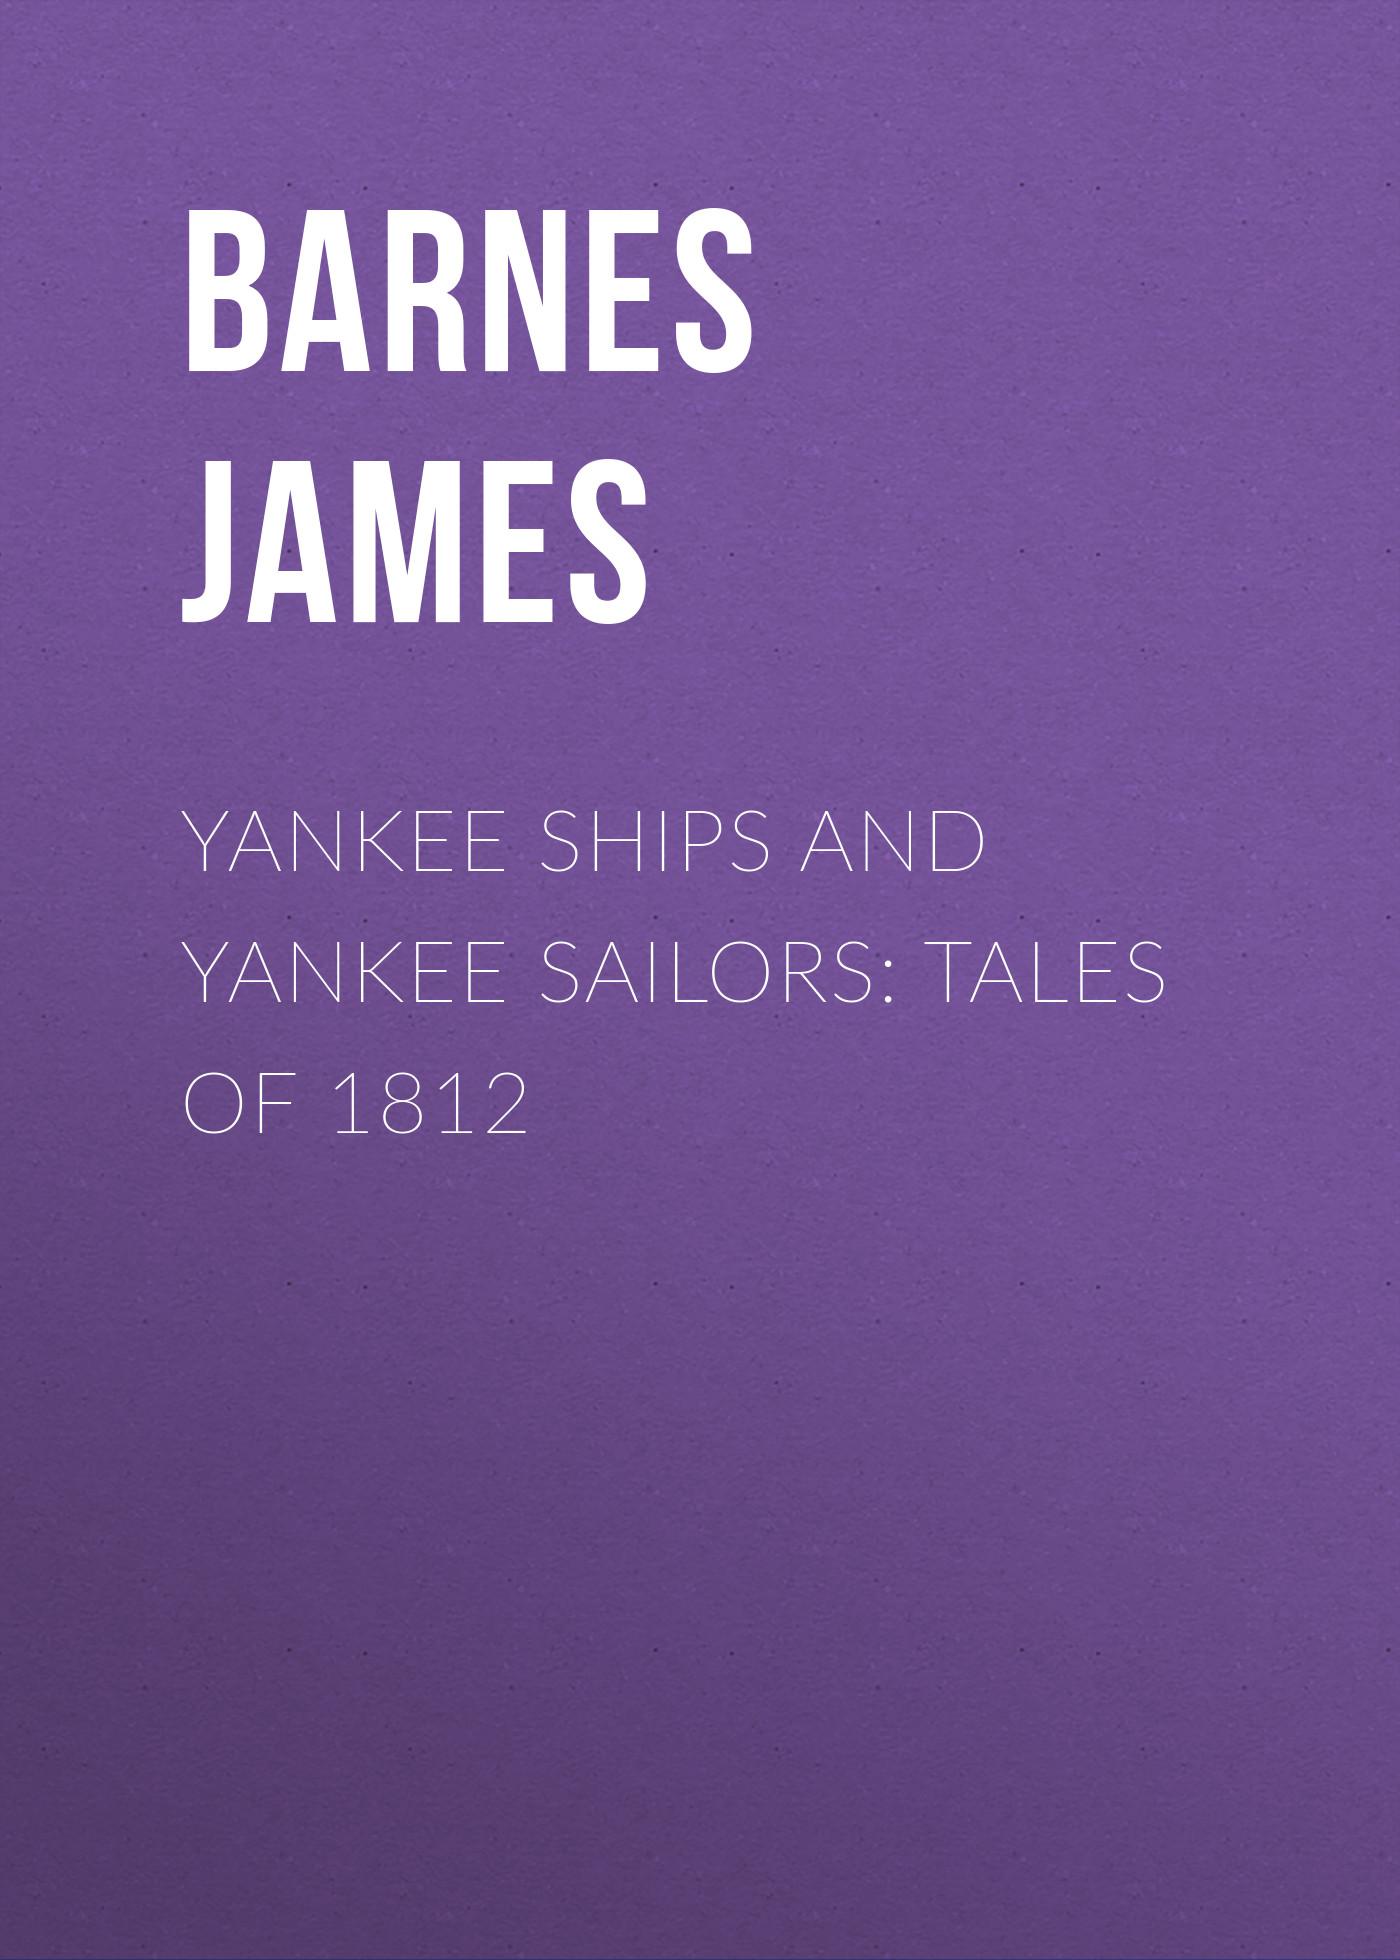 цена Barnes James Yankee Ships and Yankee Sailors: Tales of 1812